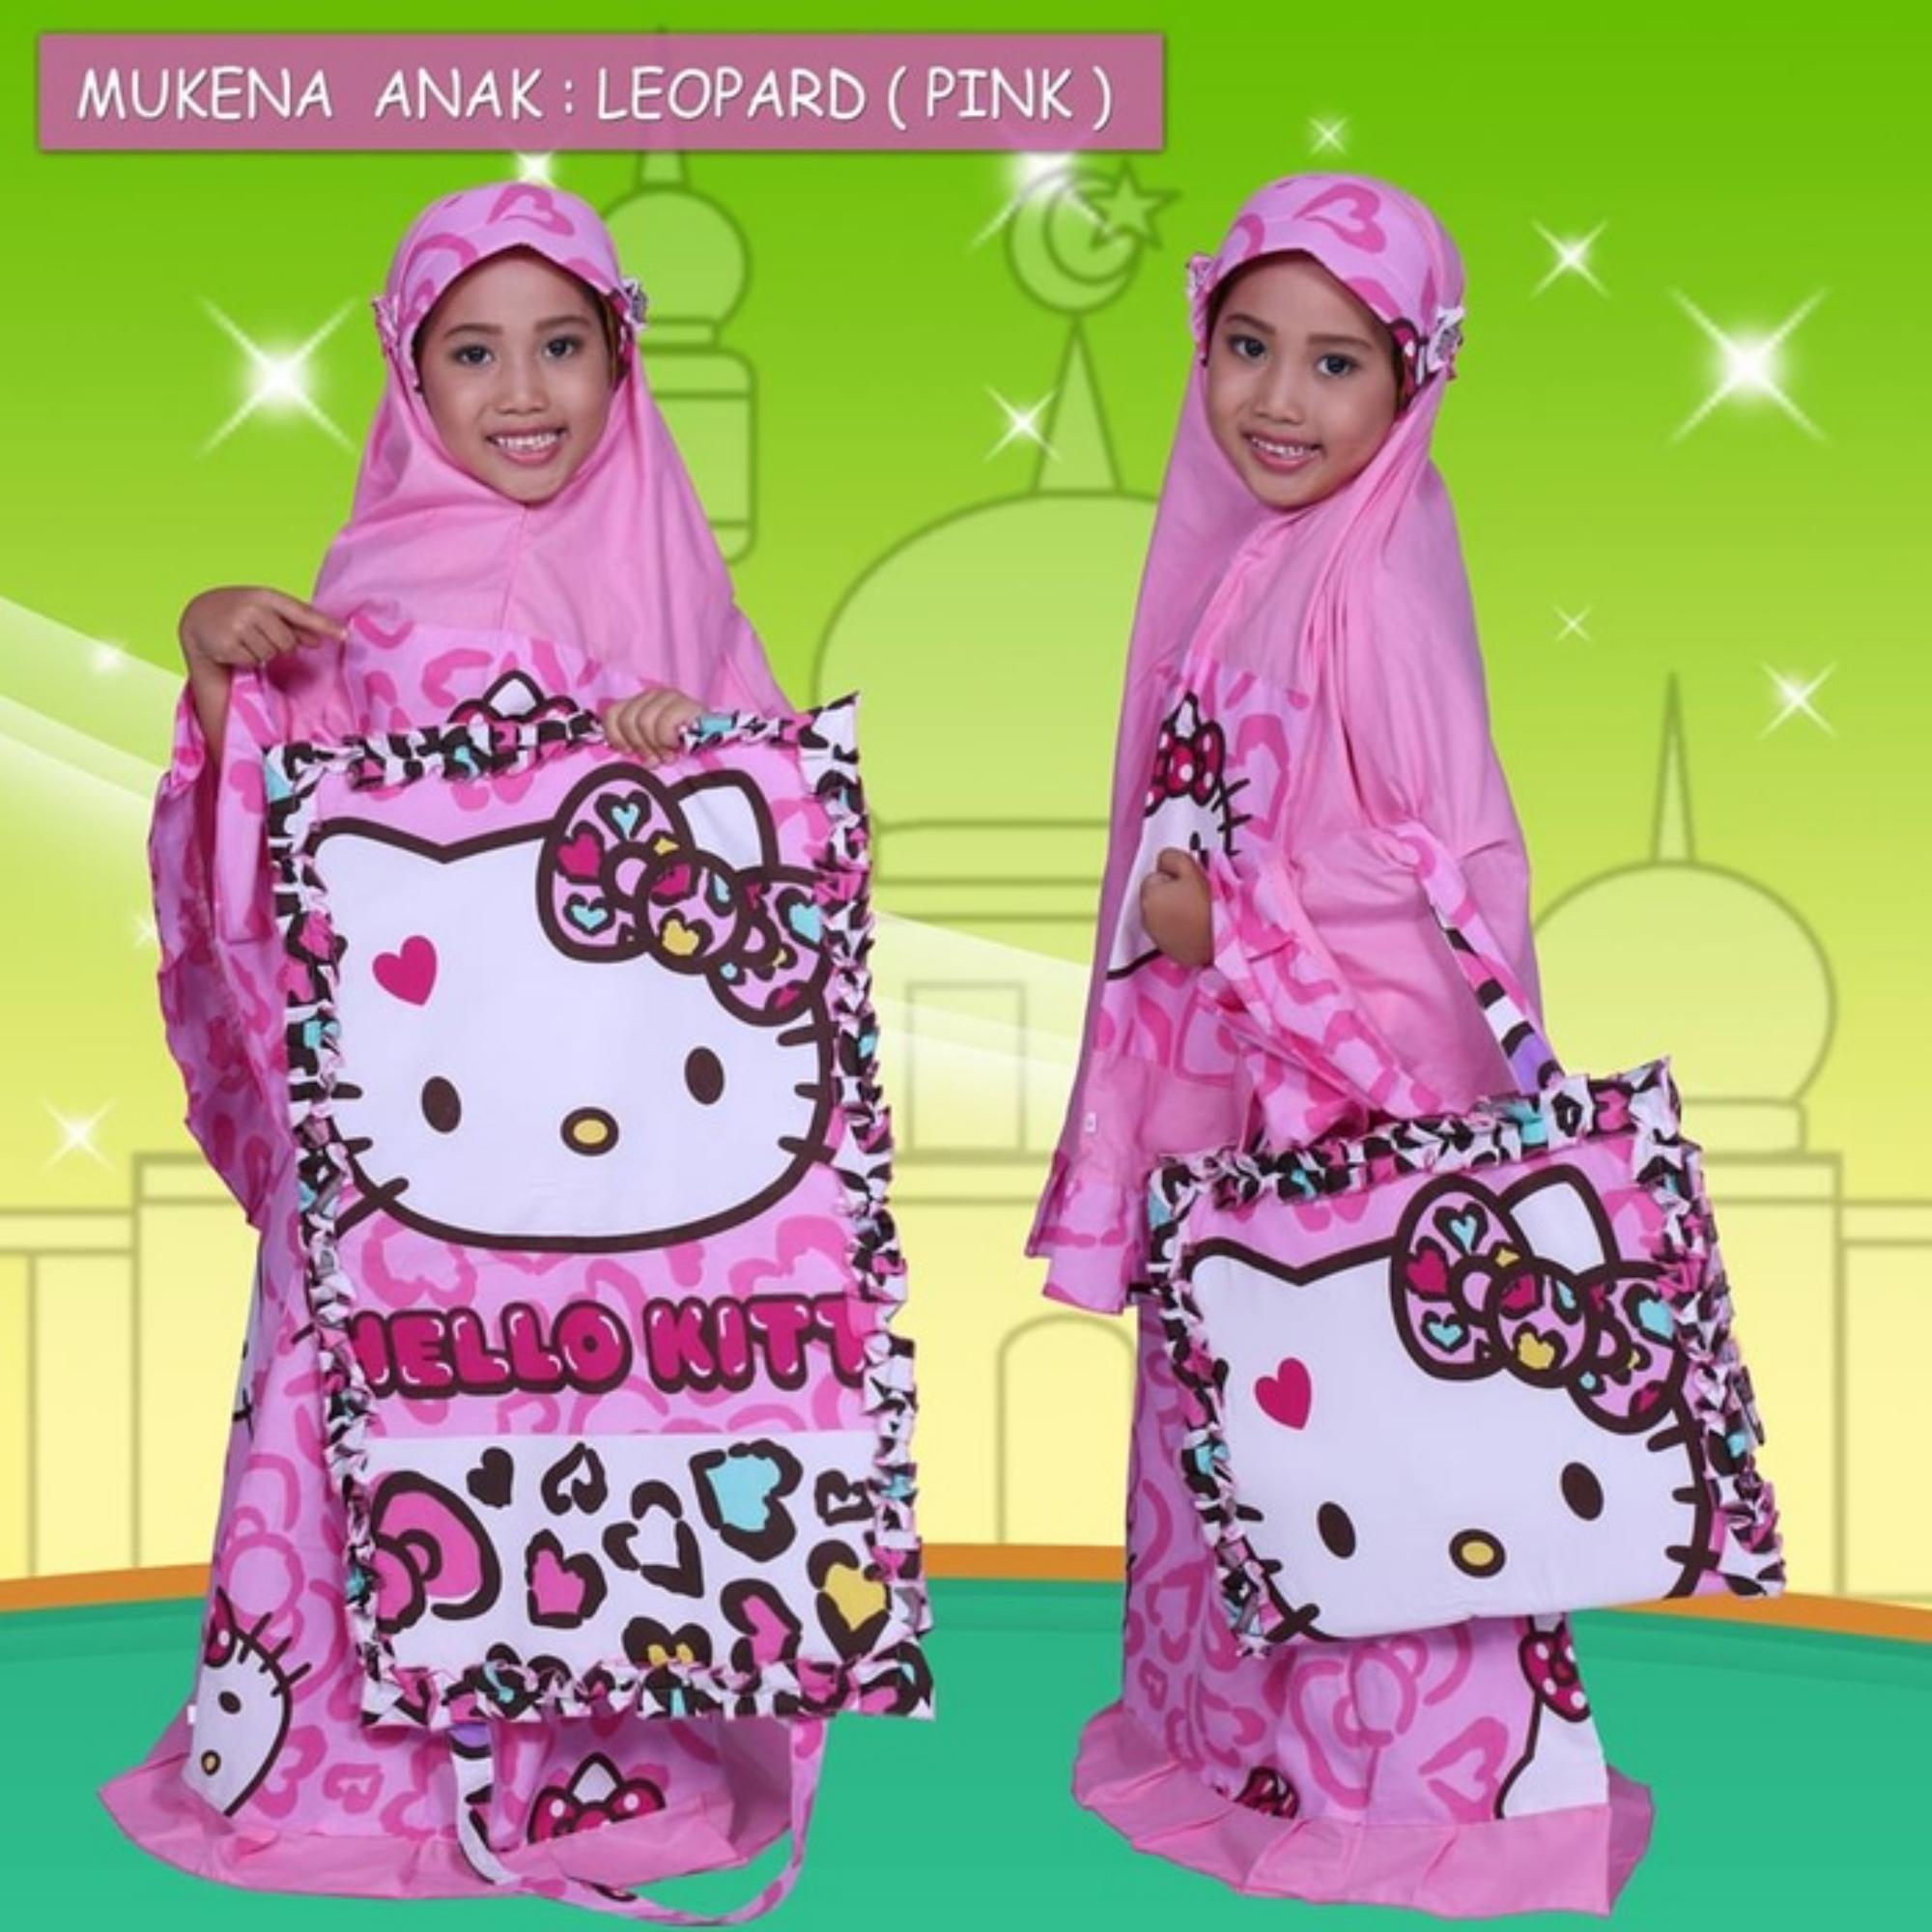 Mukena Anak Hello Kitty Leopard Pink Colour